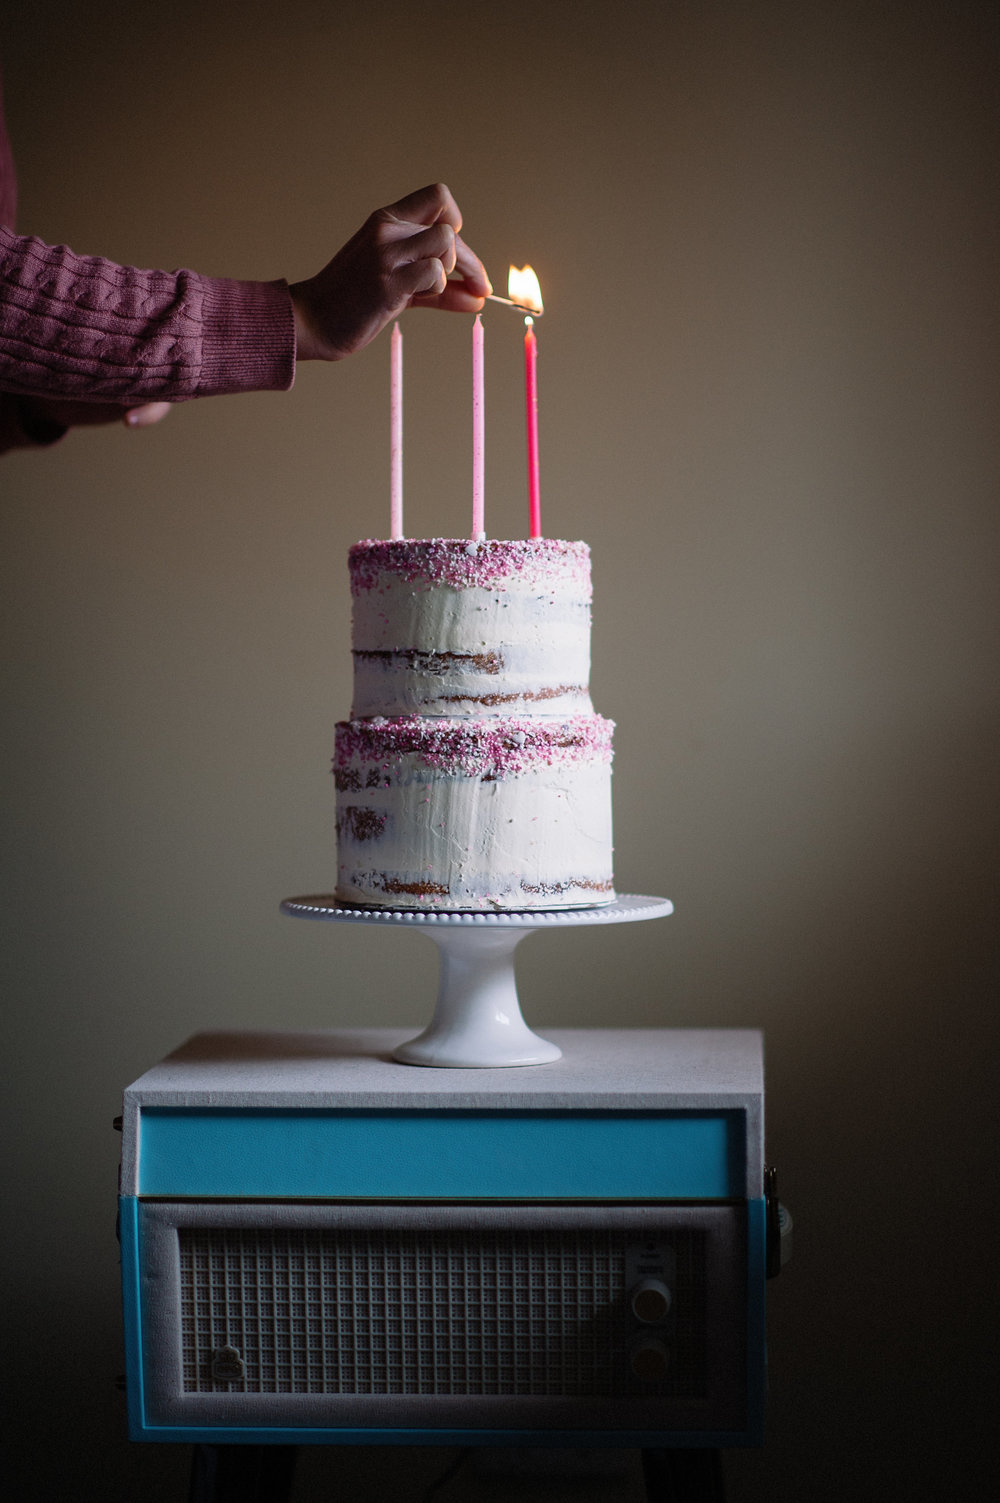 cherry-cakes-8-003.jpg